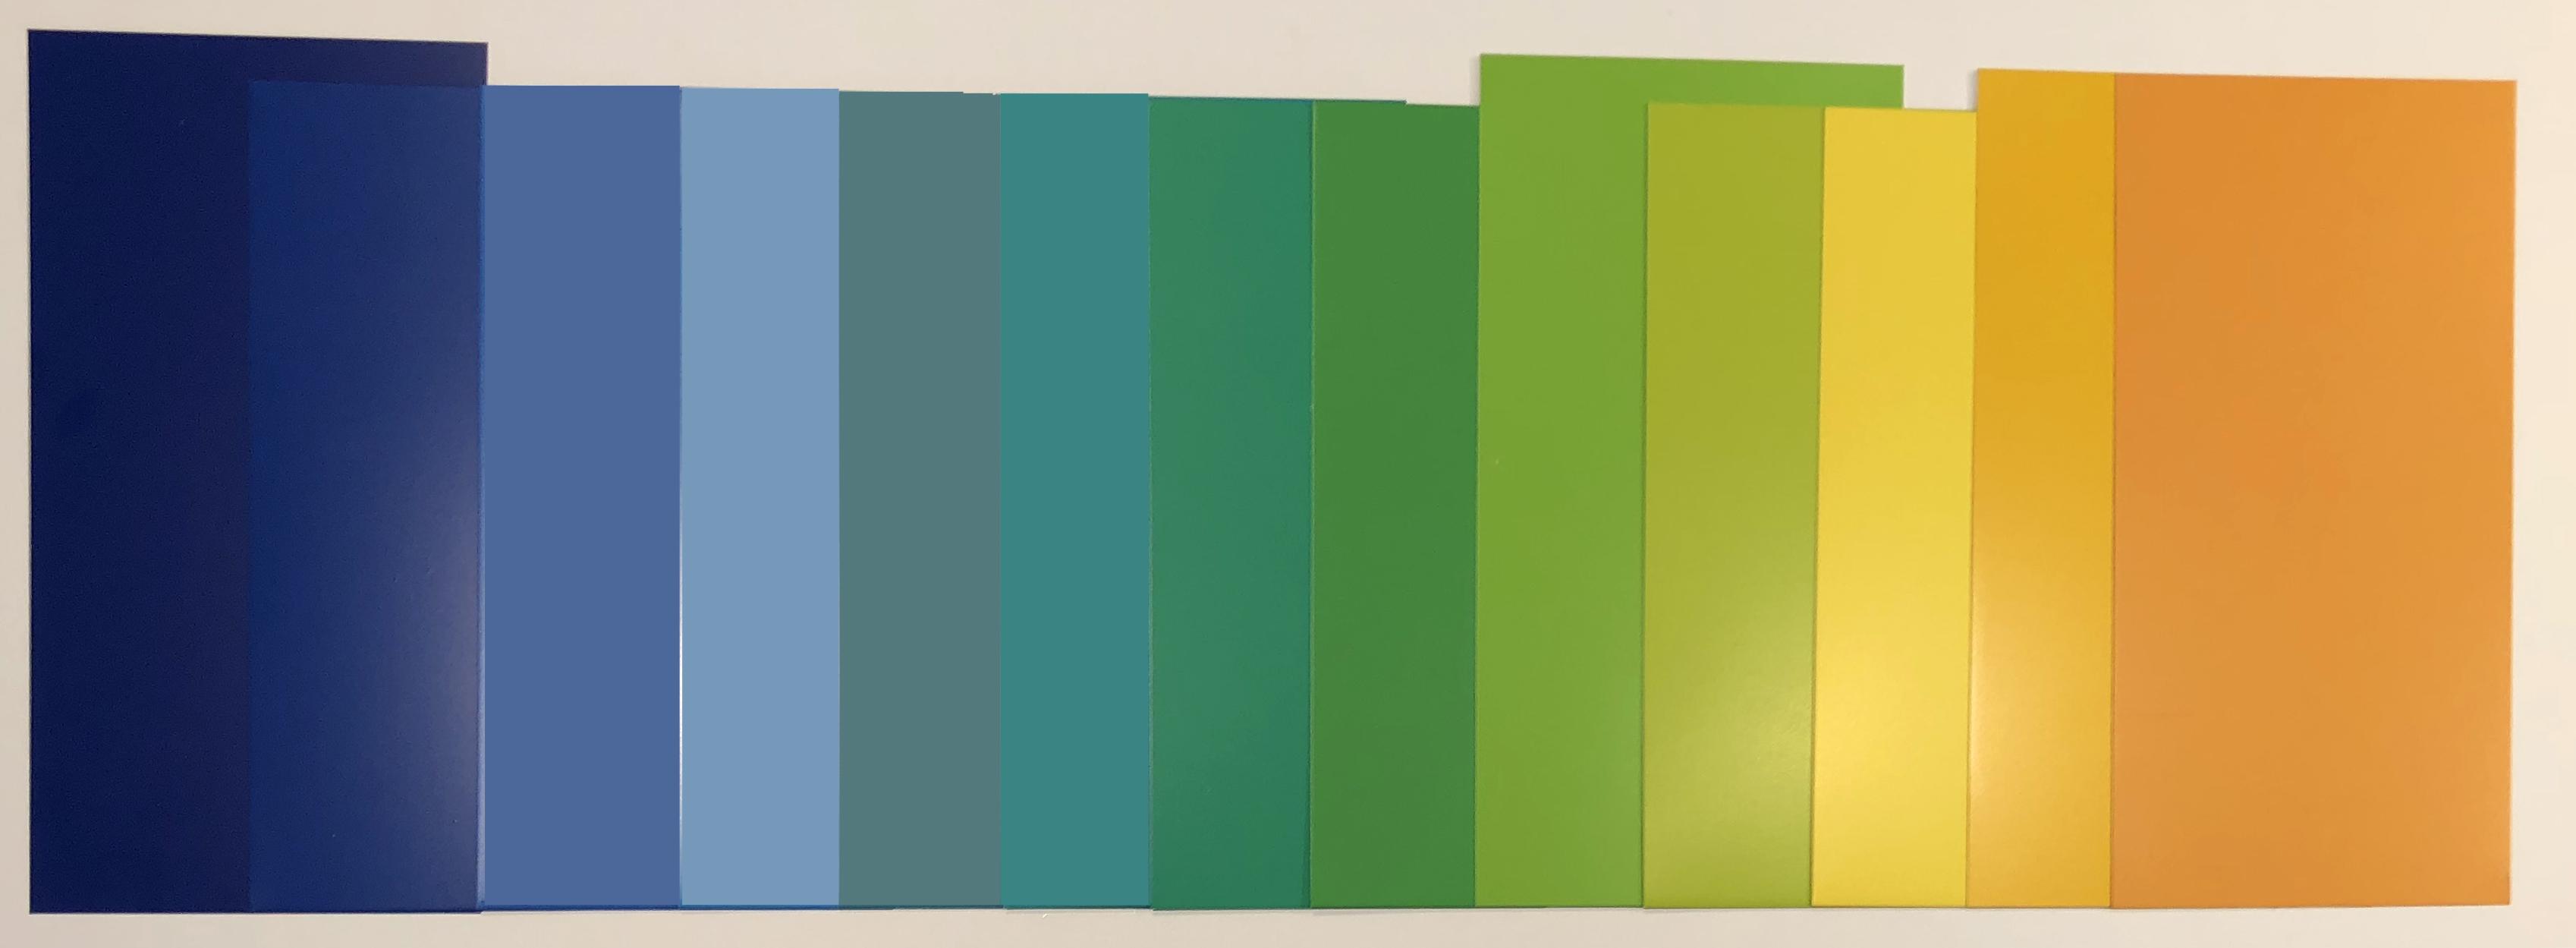 Farbspektrum der Reynobond Fassade